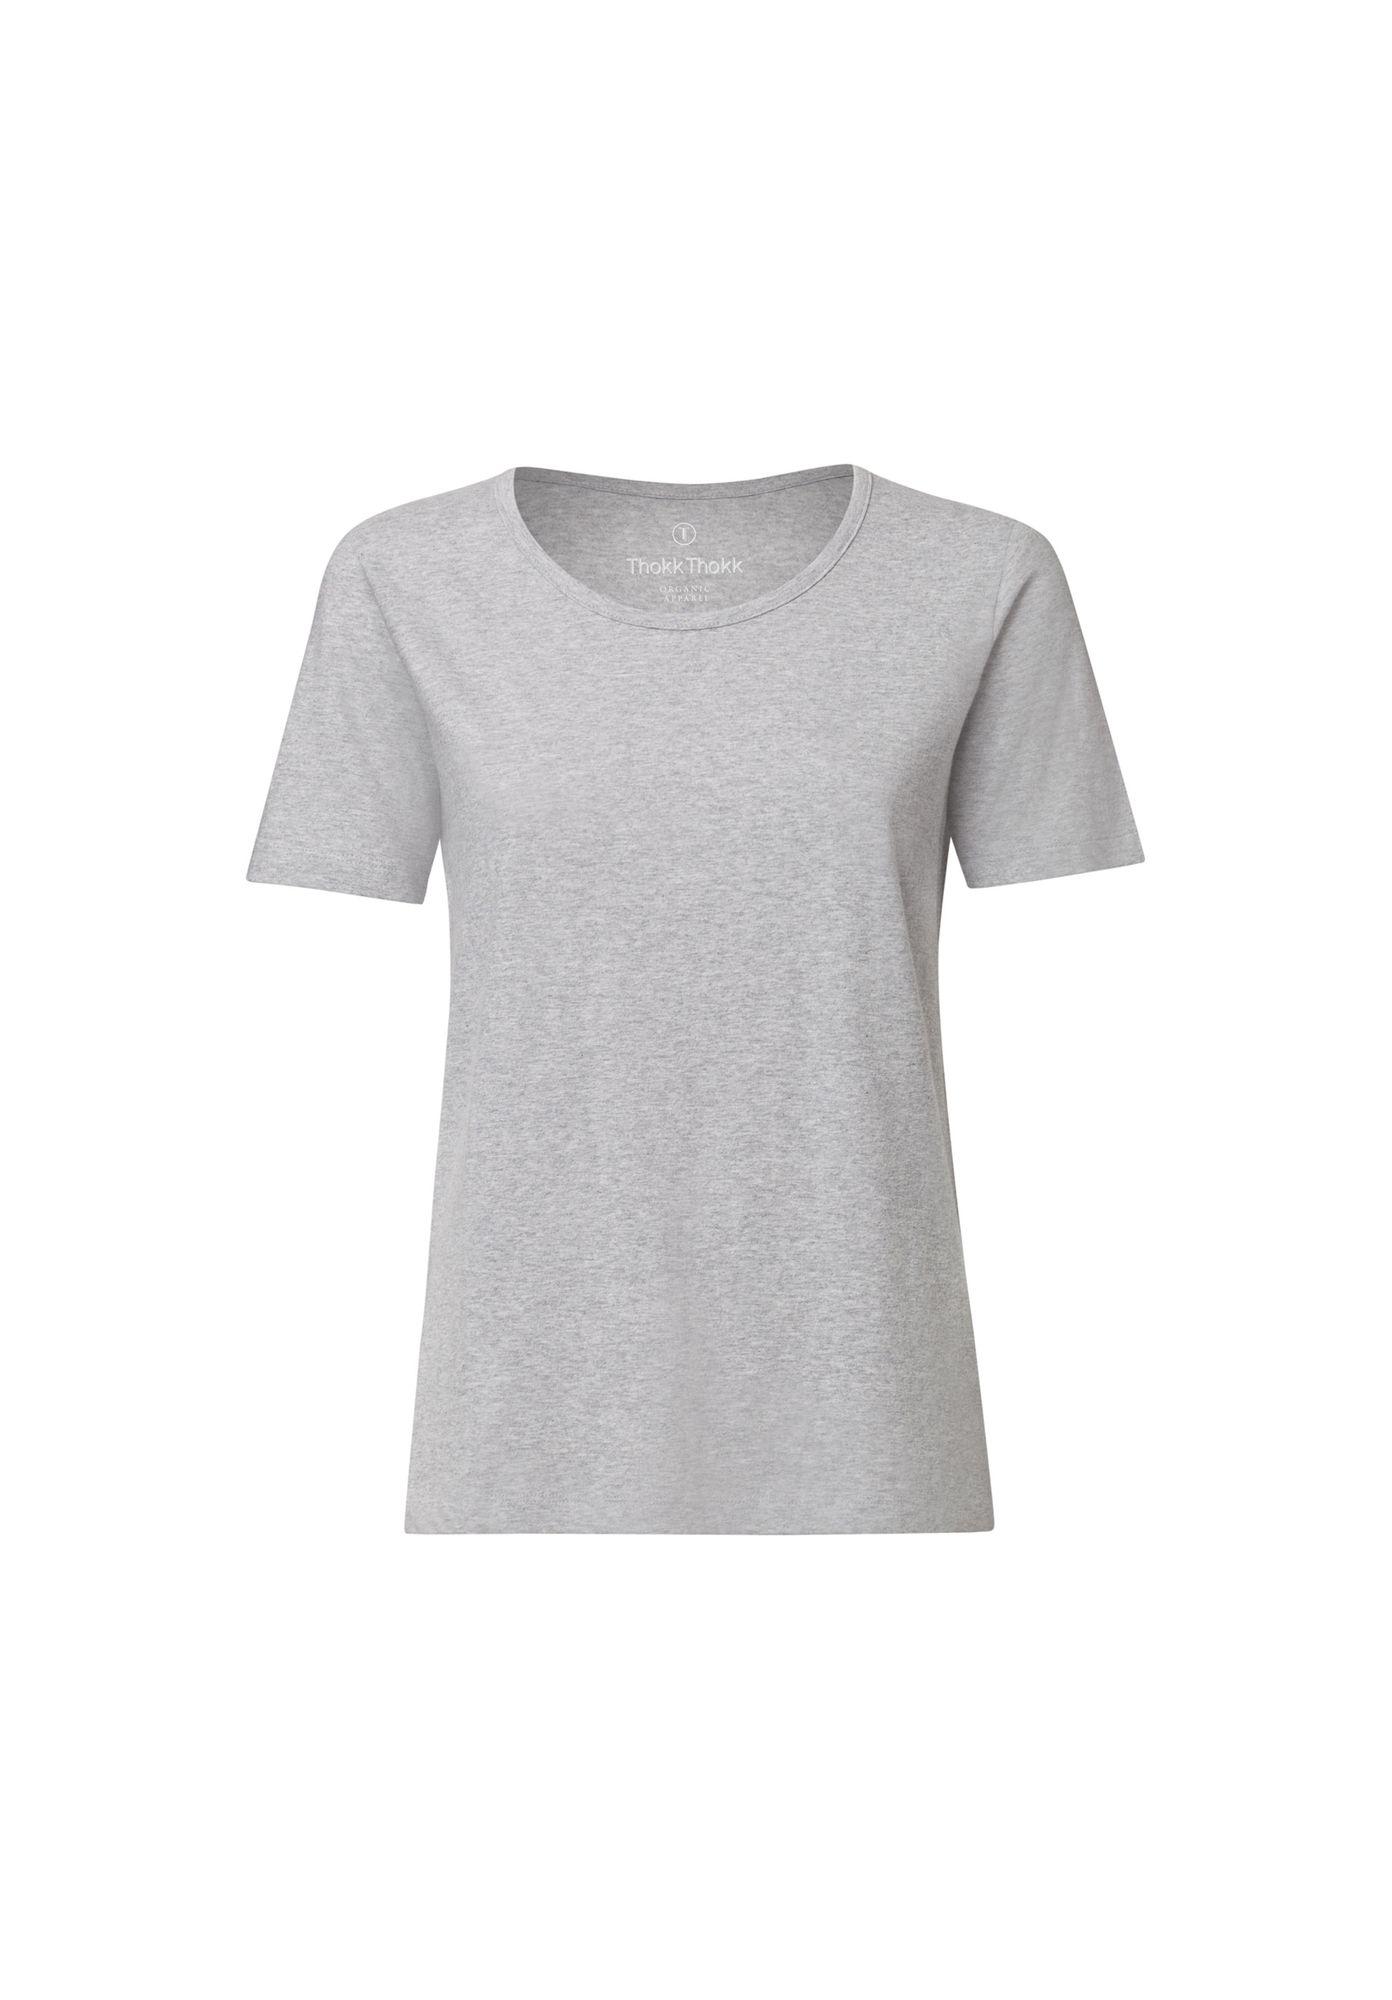 TT64 T-Shirt Grey Melange